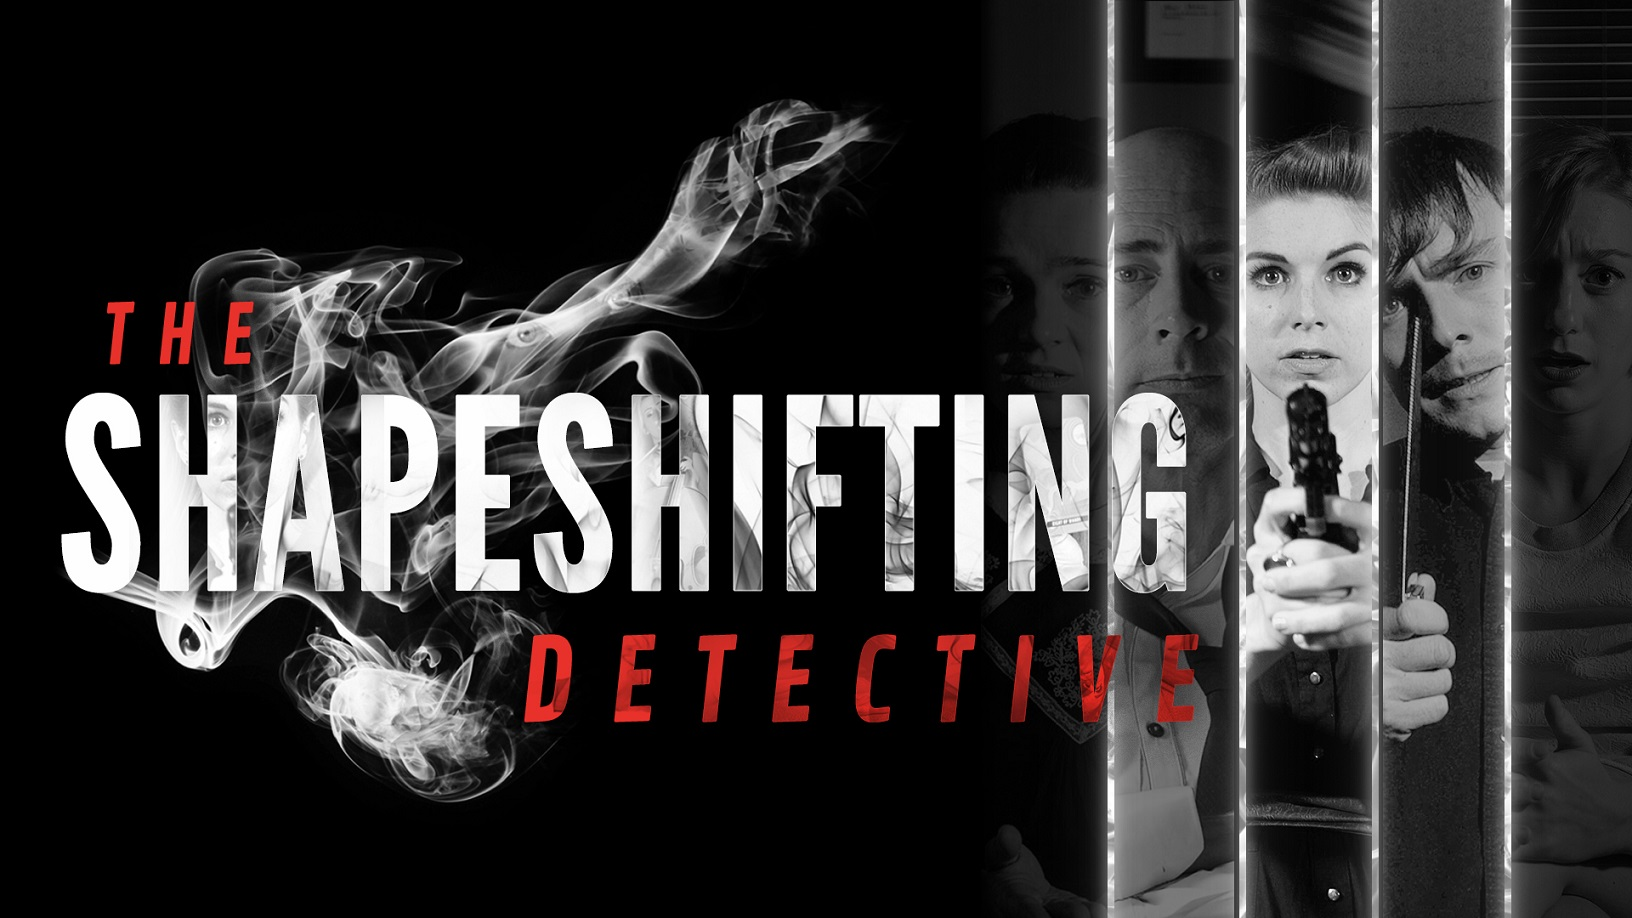 Shapeshifting detective gra